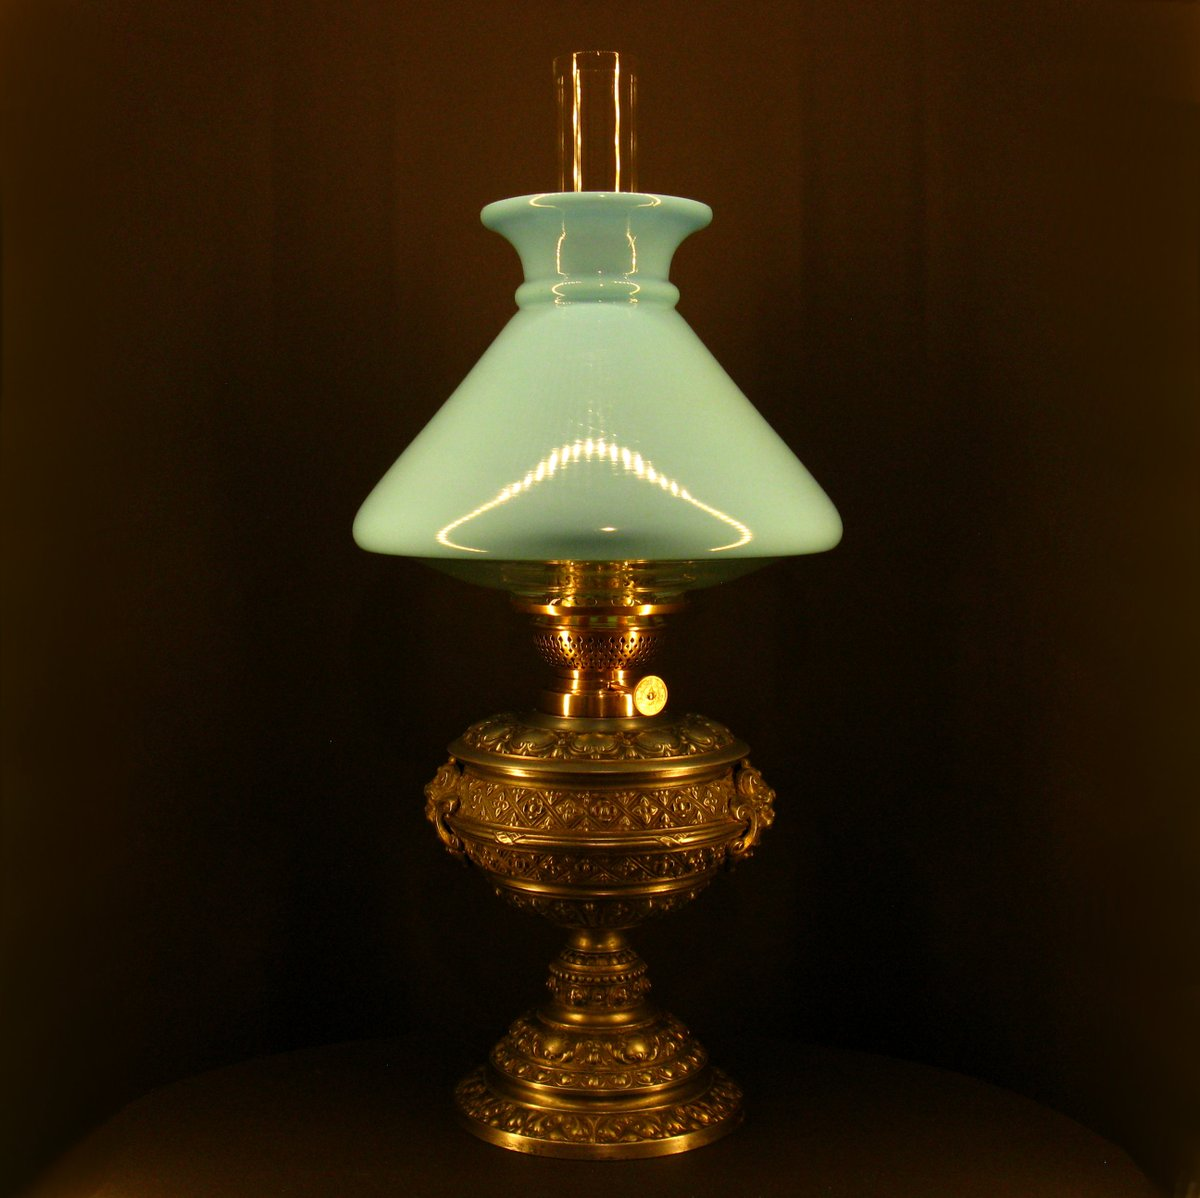 Lampa cu kerosen sub presiune, German style